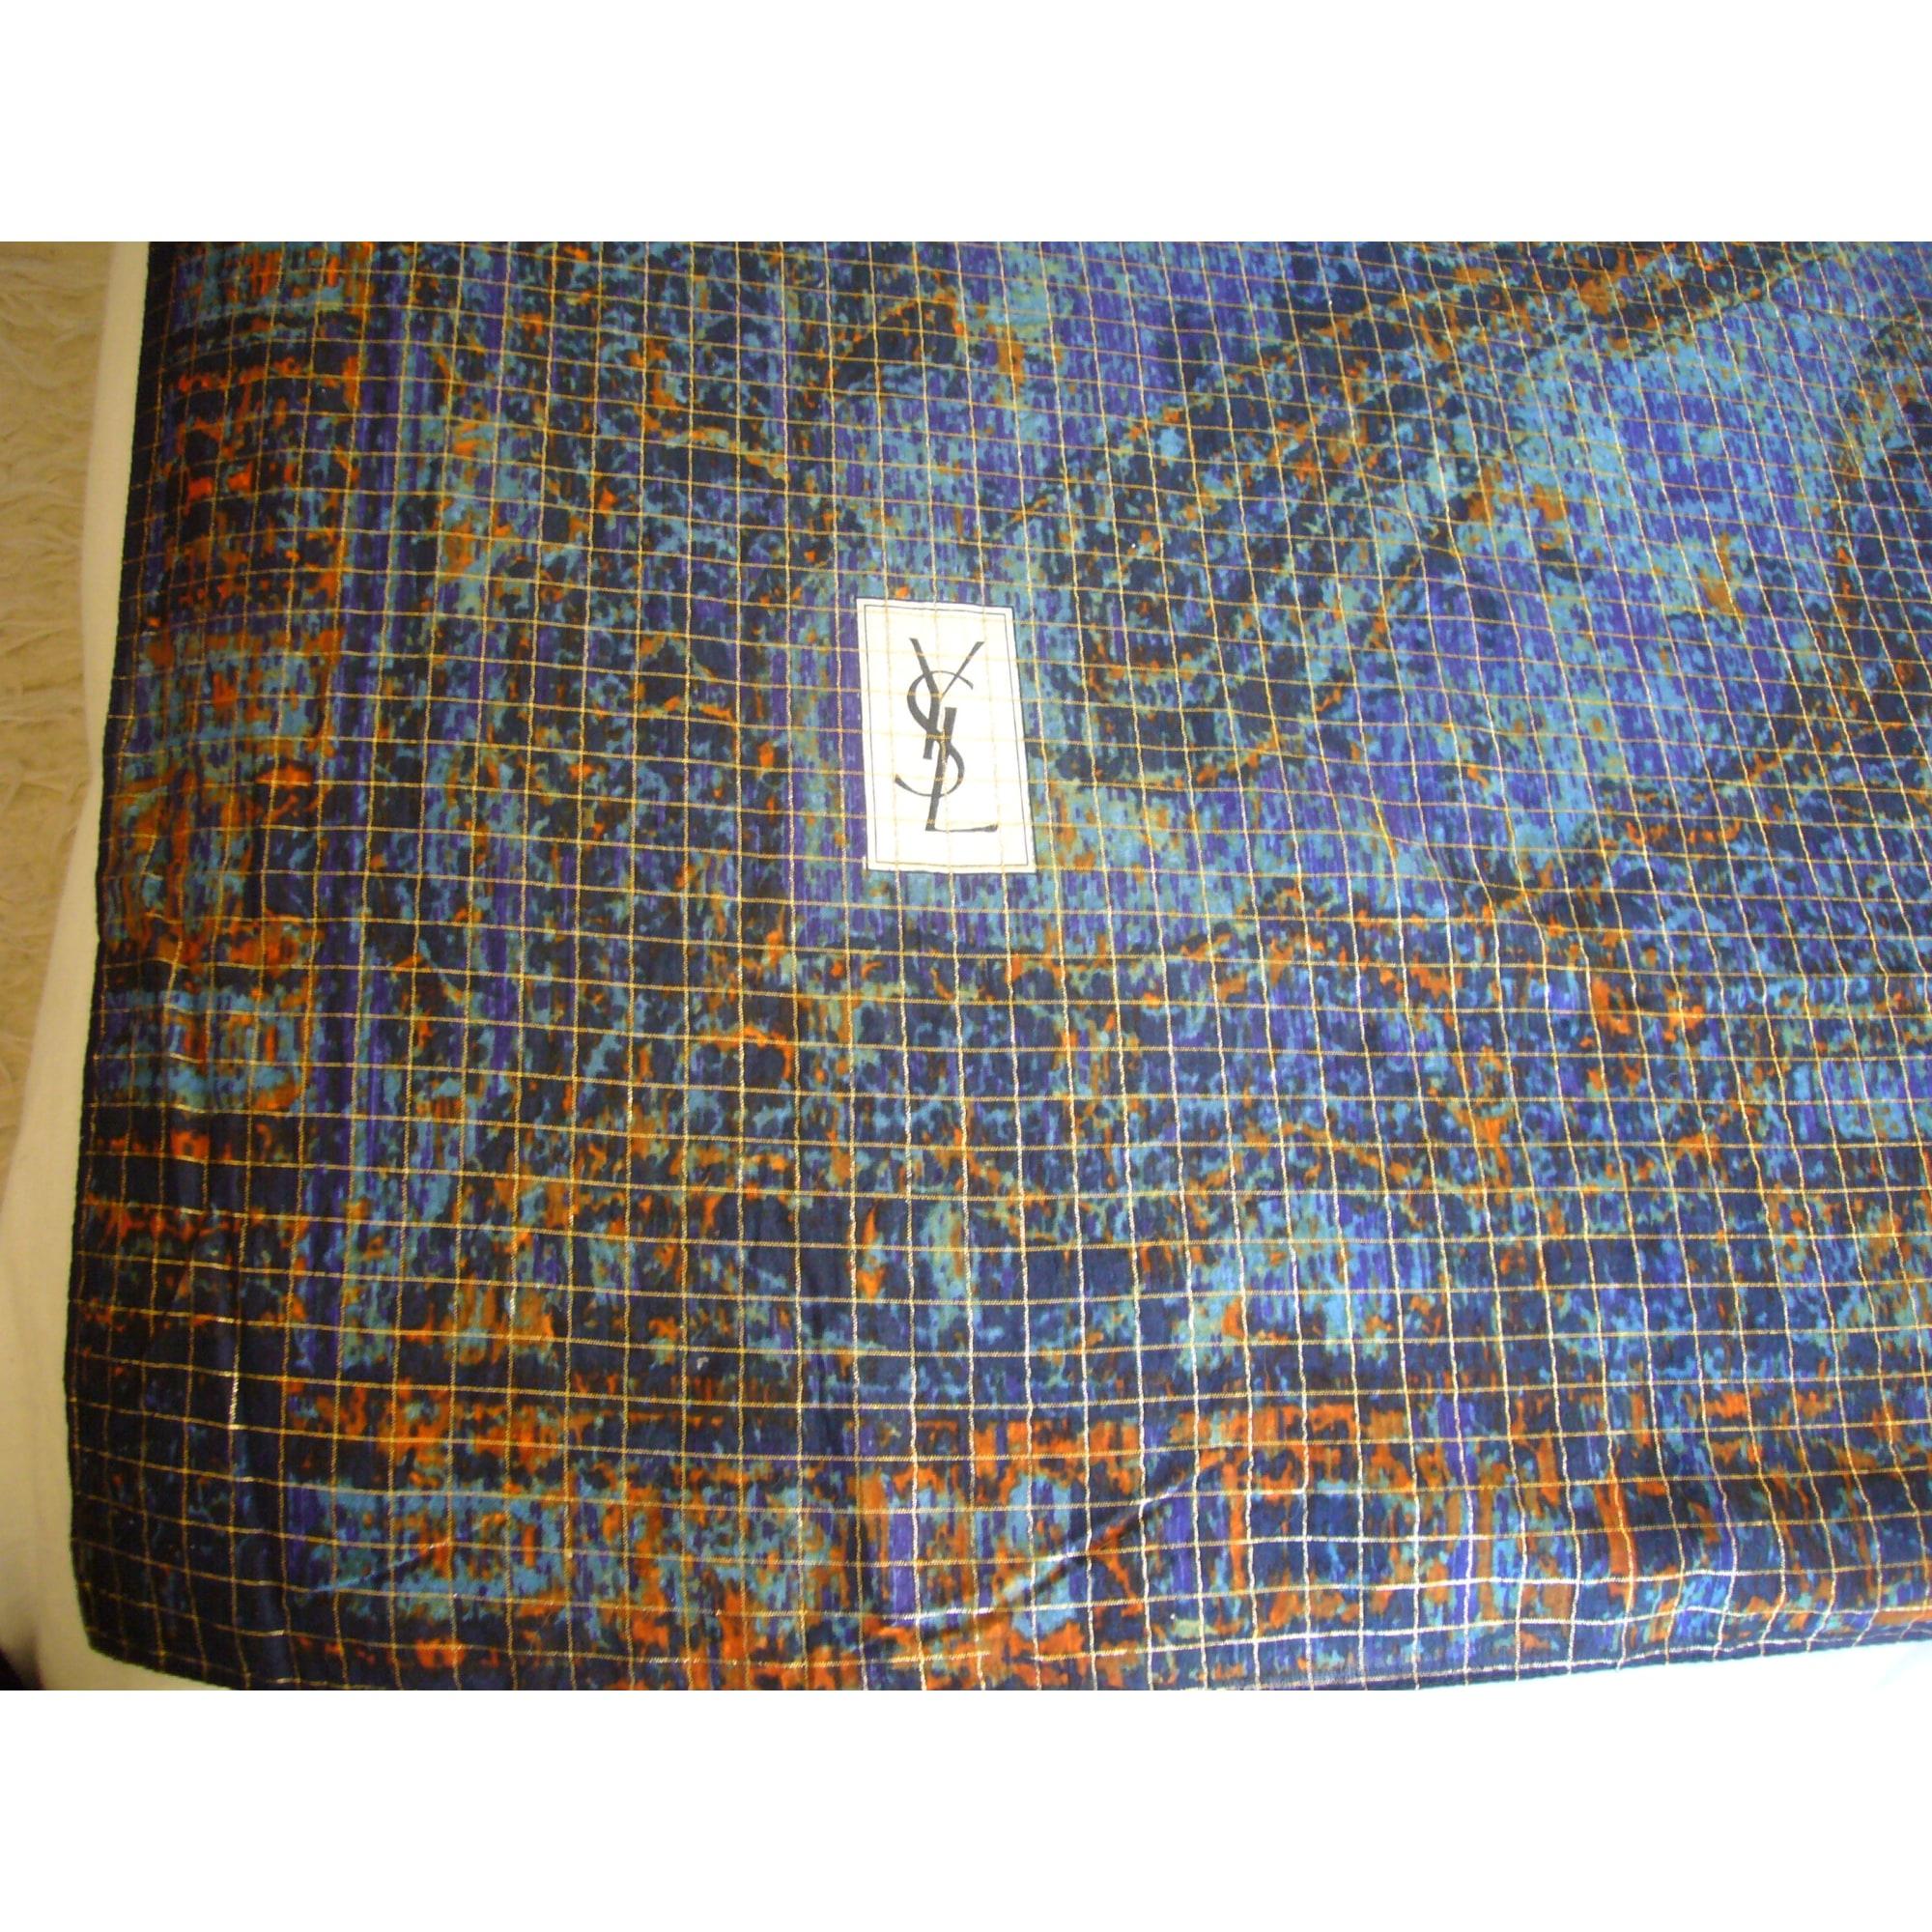 Châle YVES SAINT LAURENT Bleu, bleu marine, bleu turquoise